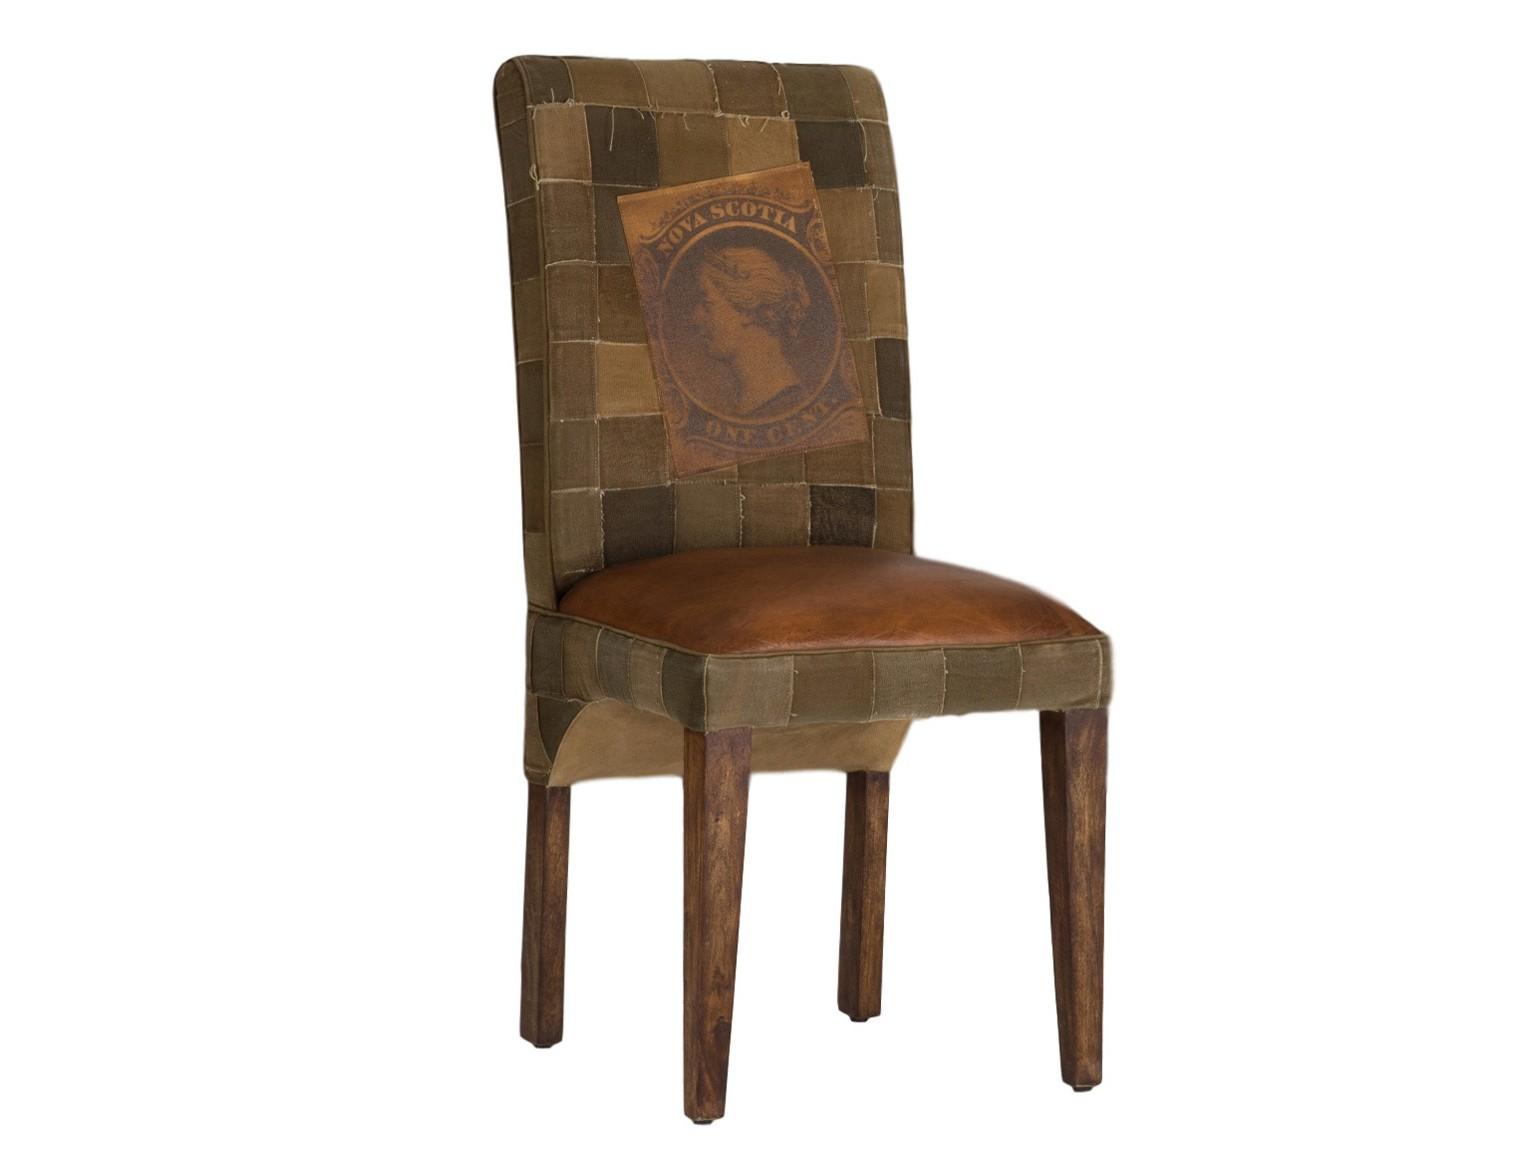 Кухонный стул Colibri 15436763 от thefurnish